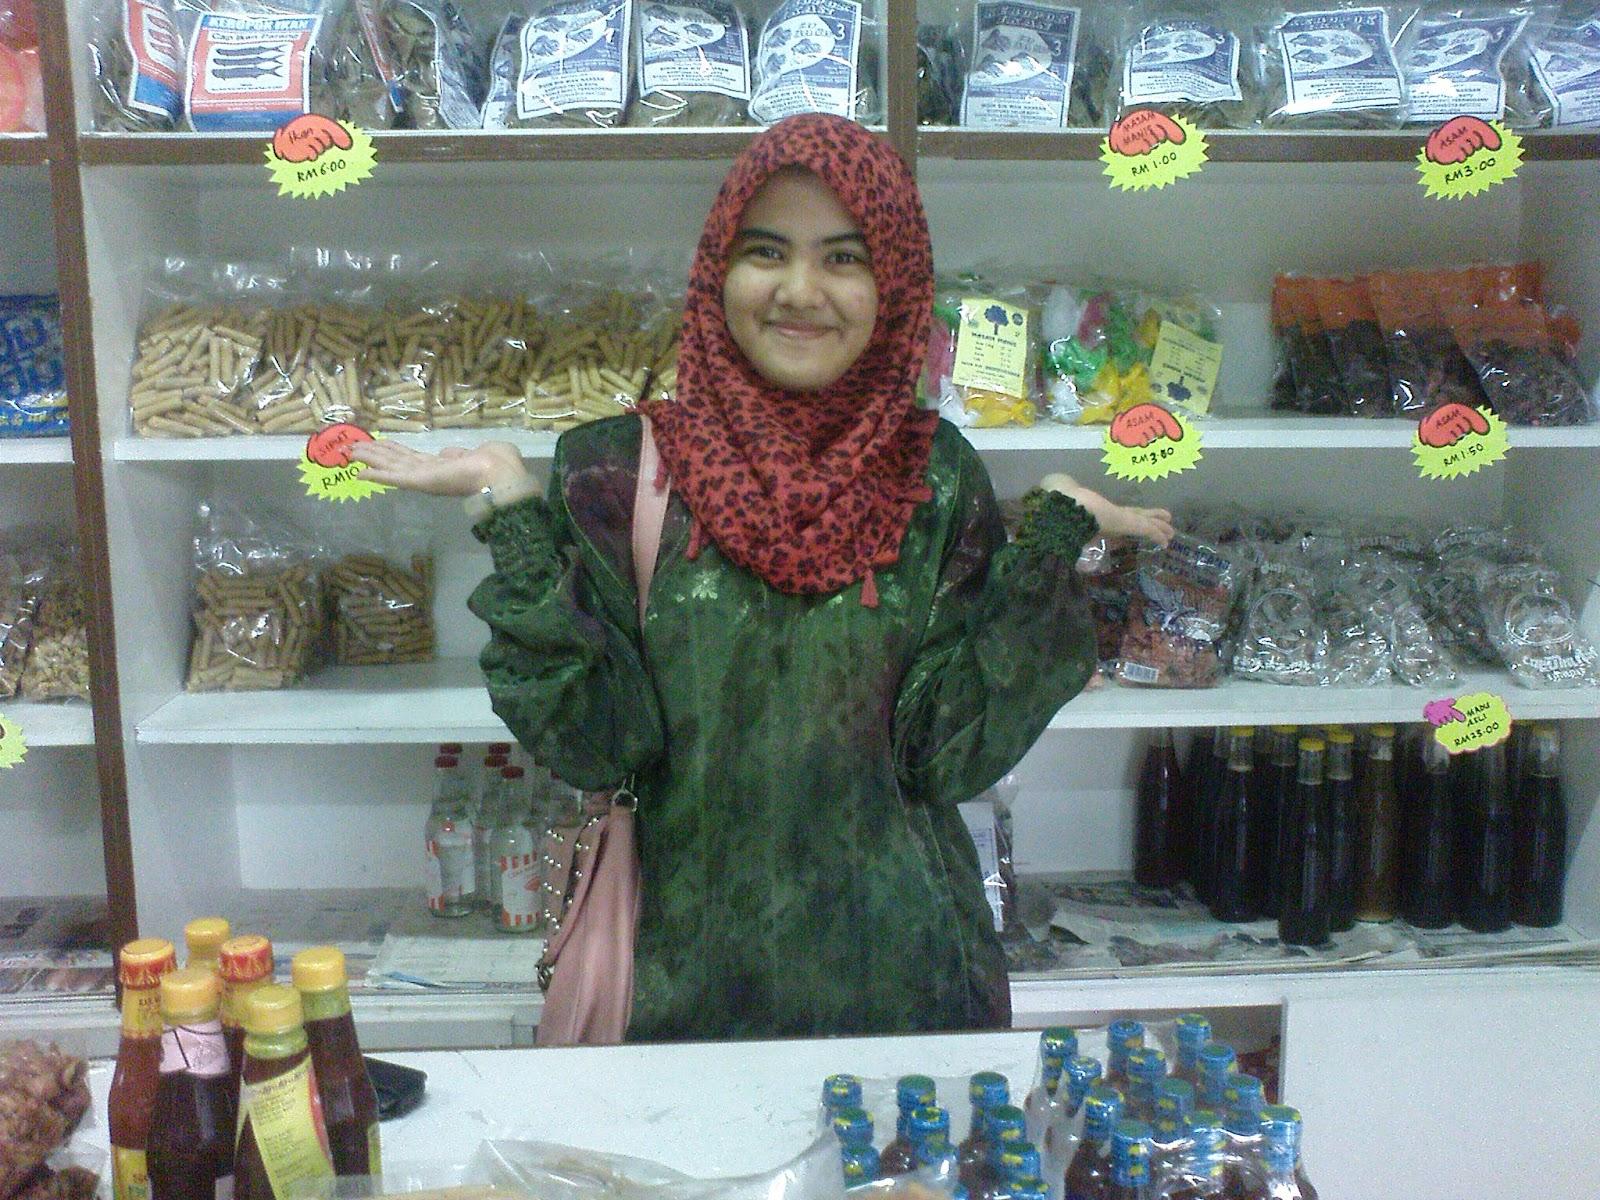 Melayu awek bp mall - 3 part 1